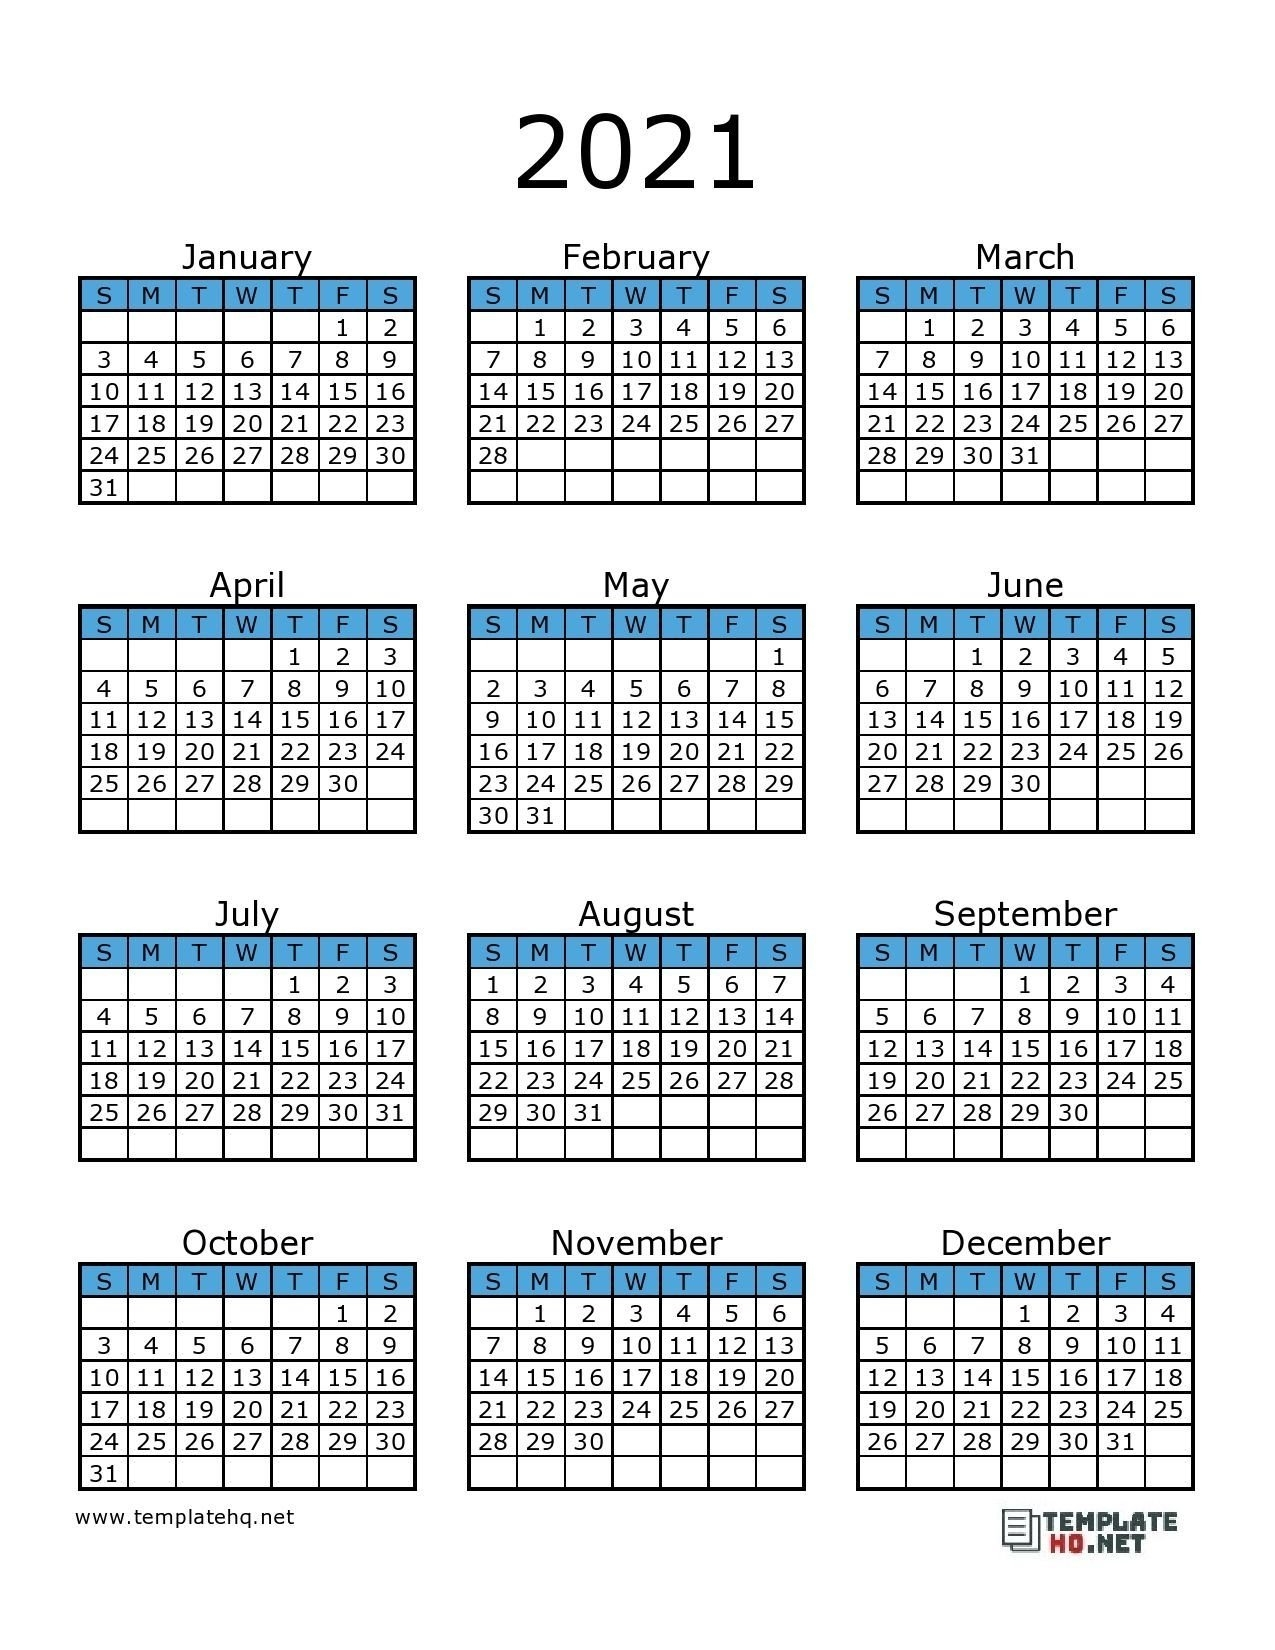 Printable 2021 F-1 Schedule - Example Calendar Printable regarding 2021 Printable Monthly Calendar Image